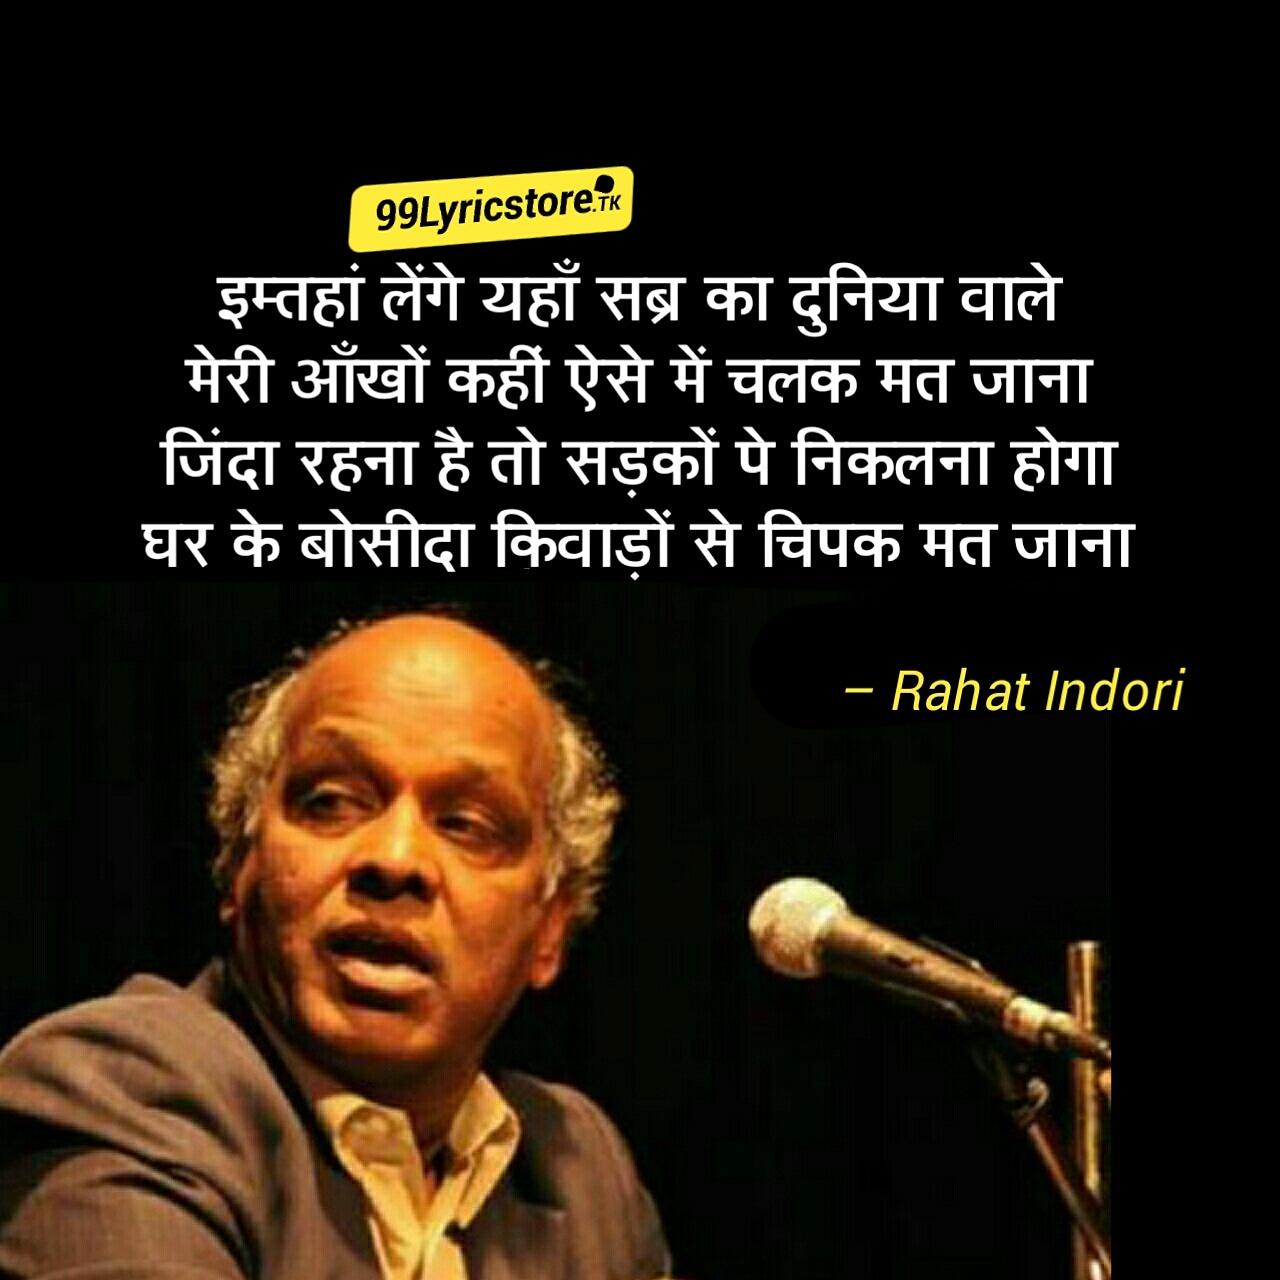 Kisi Aahoo Ke Liye Dur Talak Mat Jaana' written and performed by Rahat Indori. This poetry is best Ghazal and Shayari of Rahat Indori.